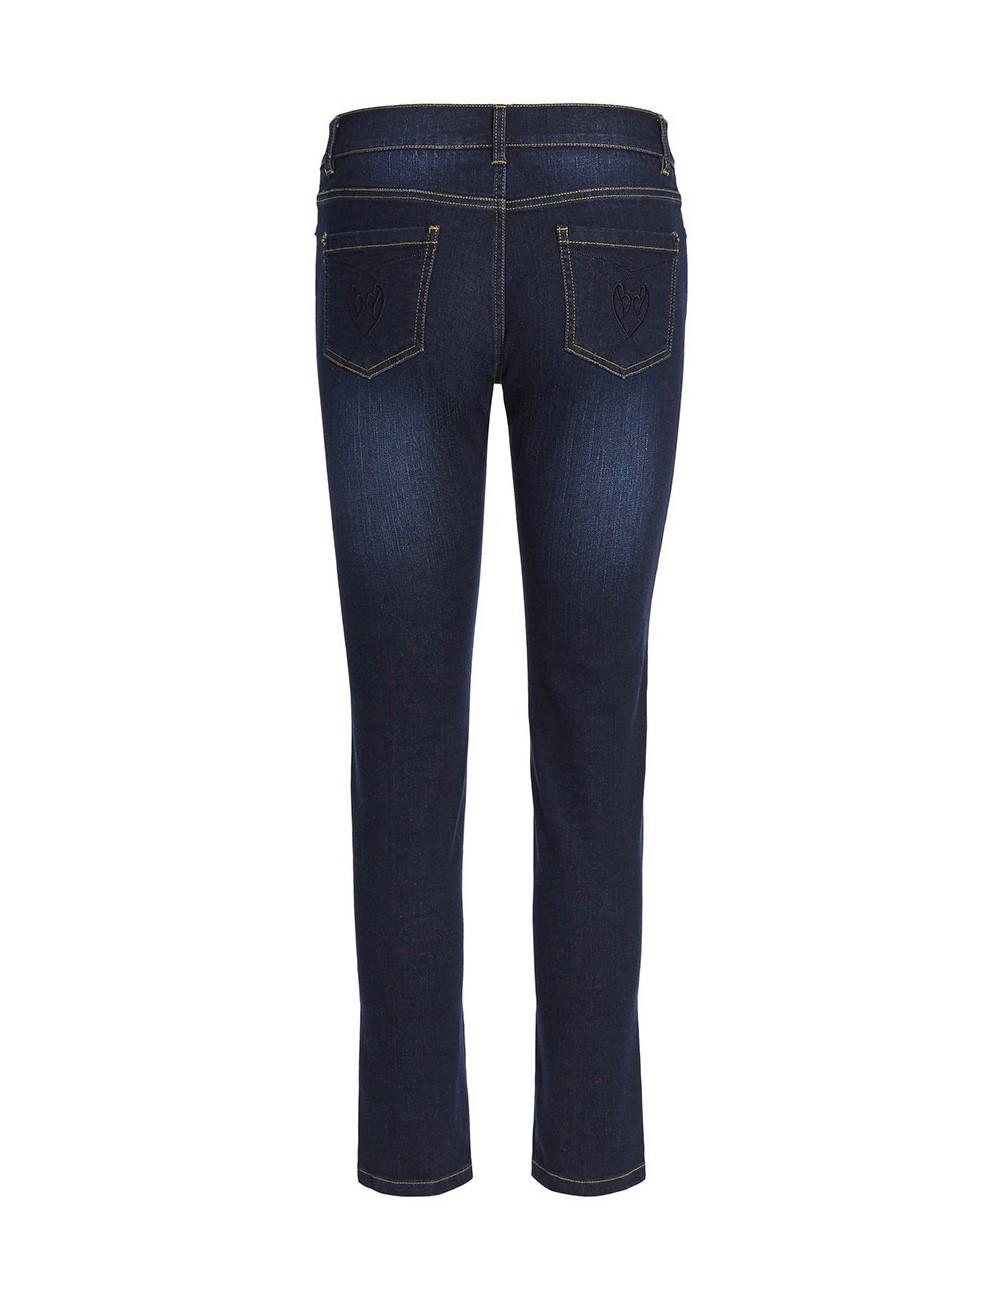 canillac 7 8 jeans denim mode hosen 7 8 hosen. Black Bedroom Furniture Sets. Home Design Ideas